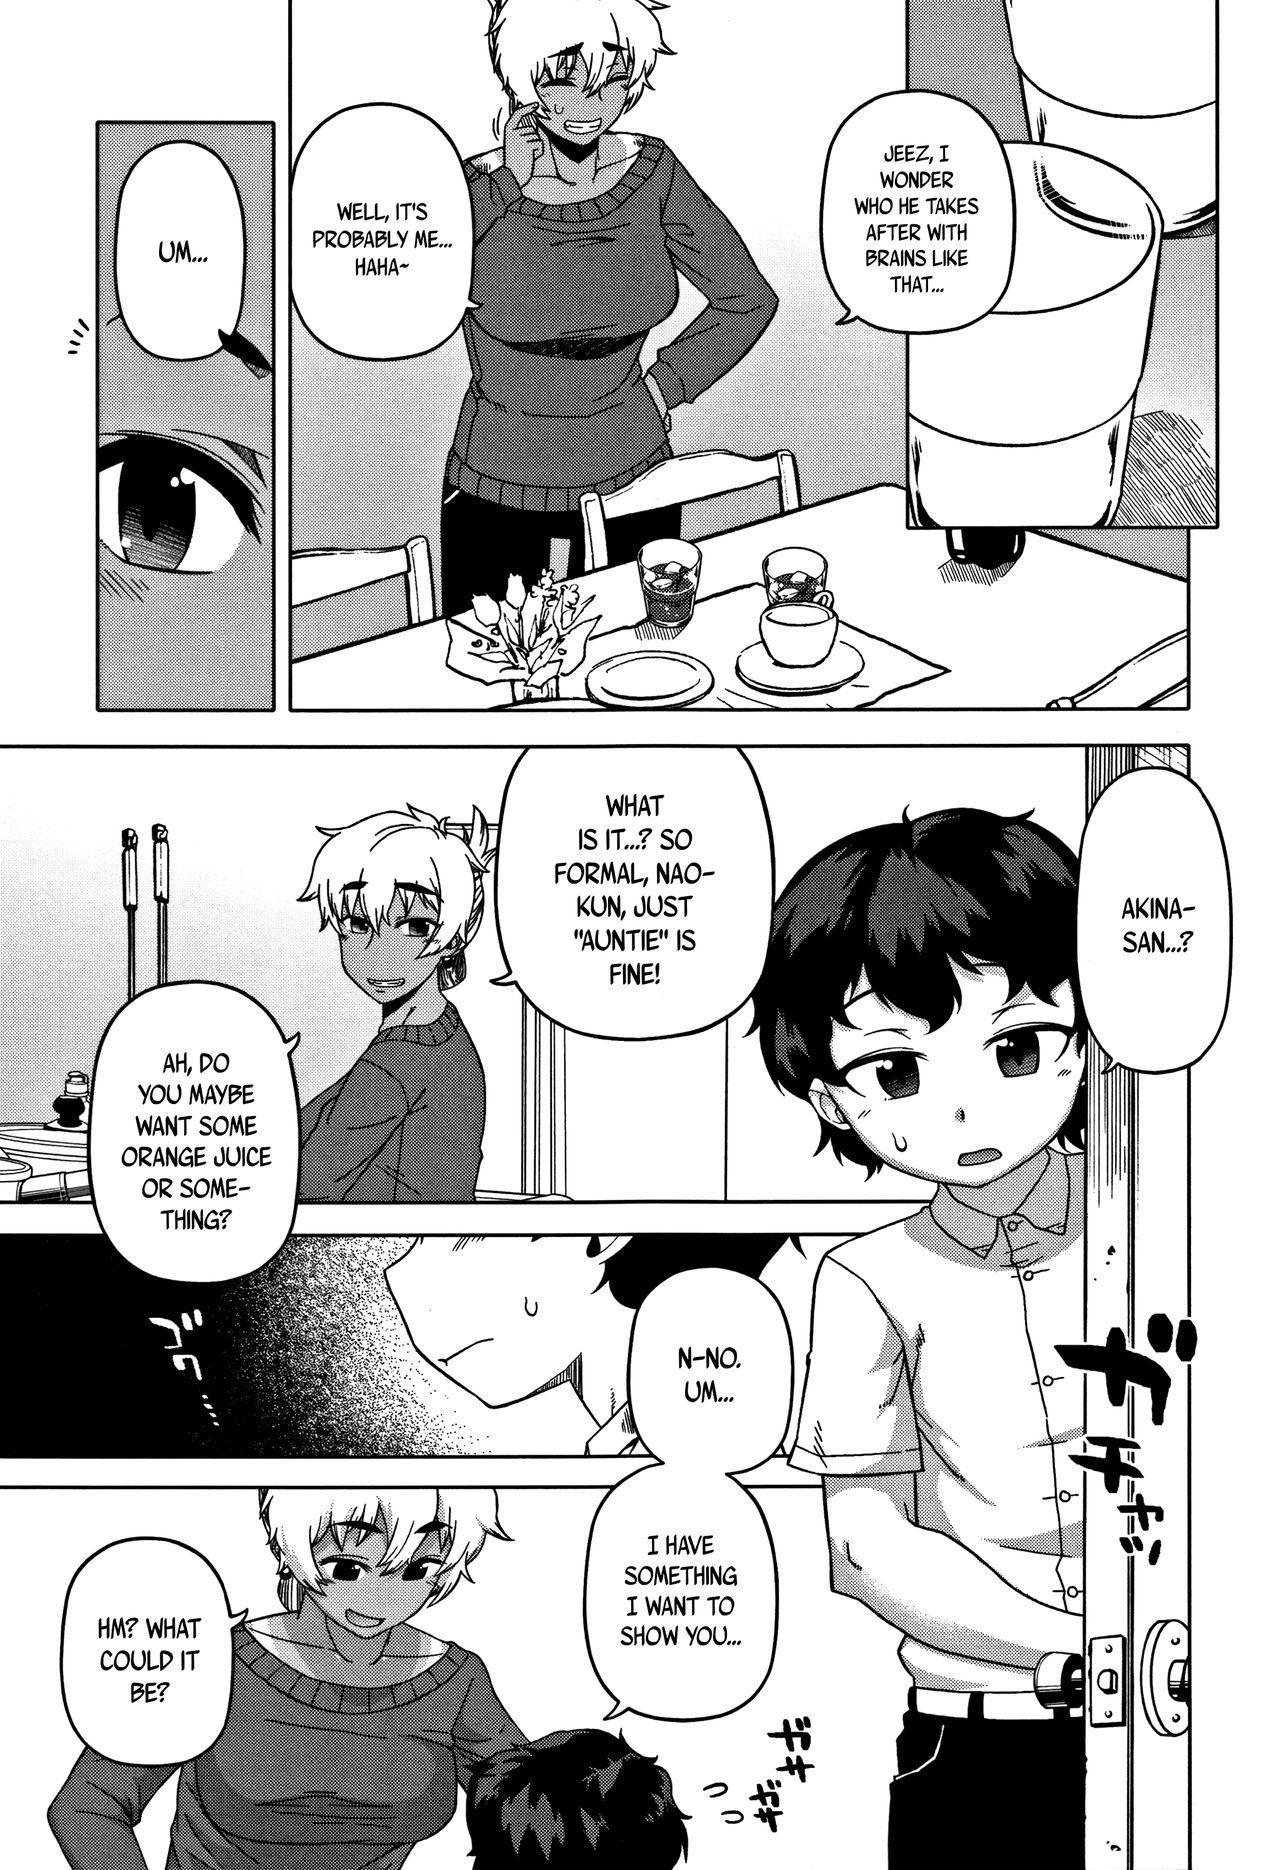 [Takatsu] Hitozuma A-san to Musuko no Yuujin N-kun - Married wife A and son's friend N-kun Ch. 1-3 [English] 10